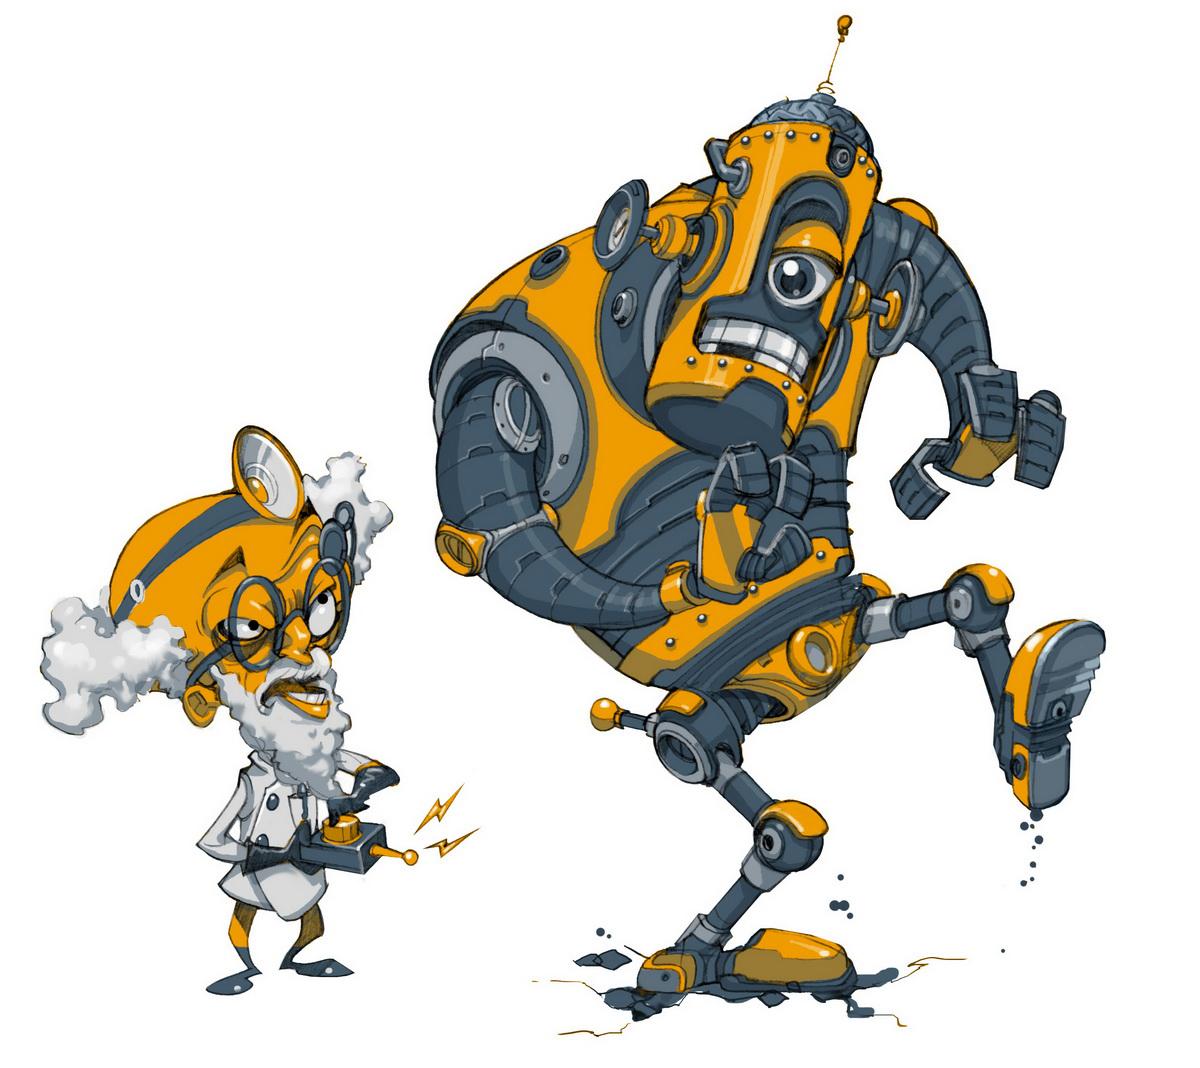 HaitaoSu_Dr.badRobot